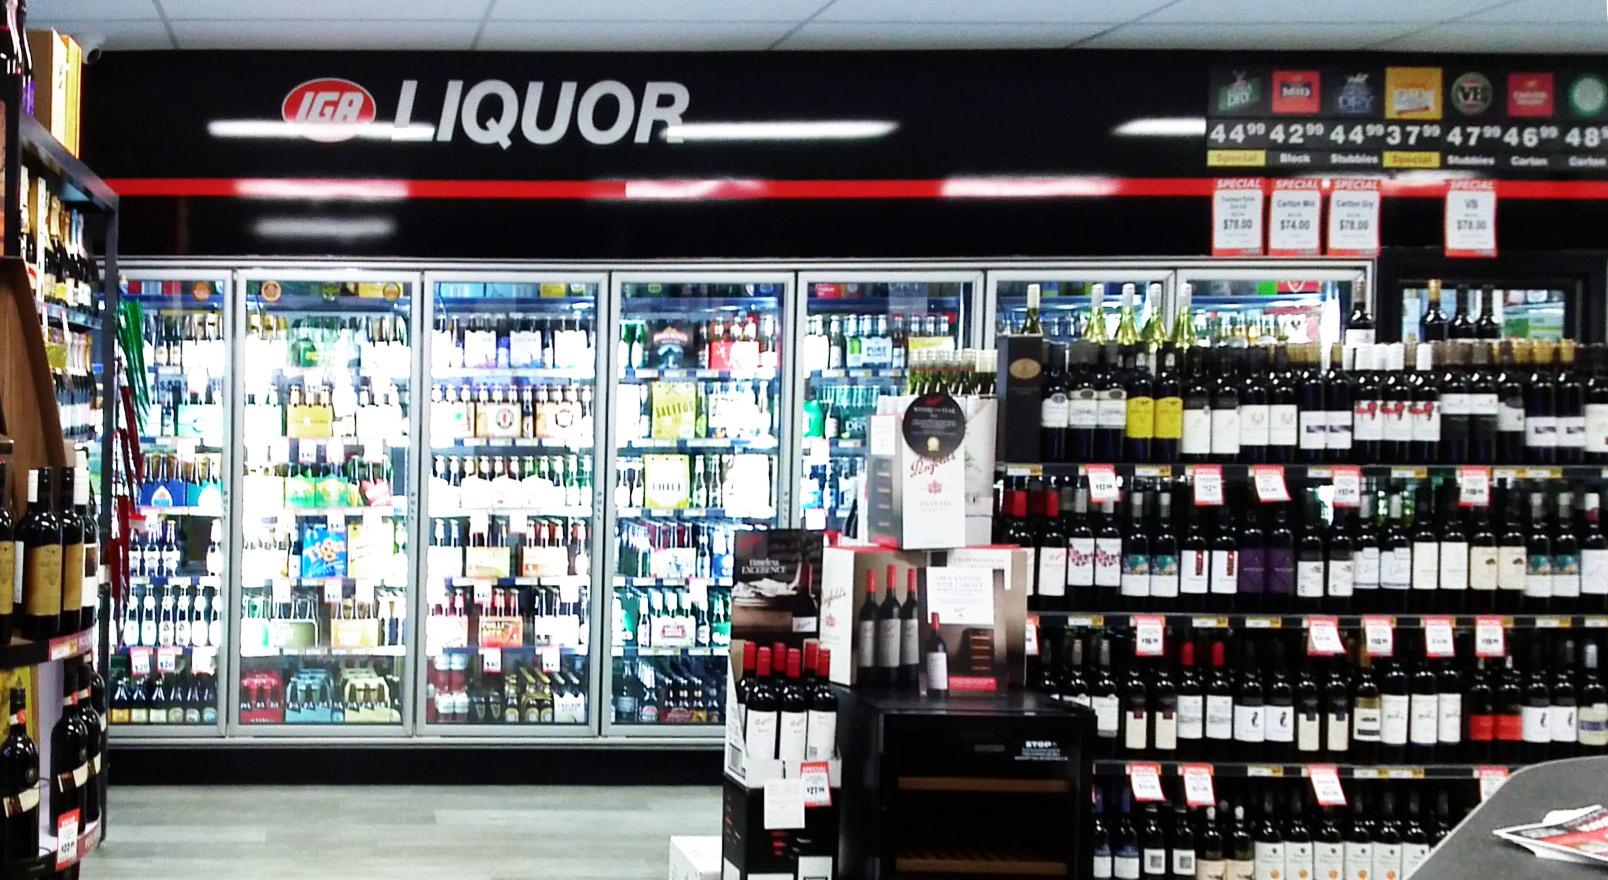 Liquor_Store_Display_Bottleshop_Coolroom_Refrigeration.jpg